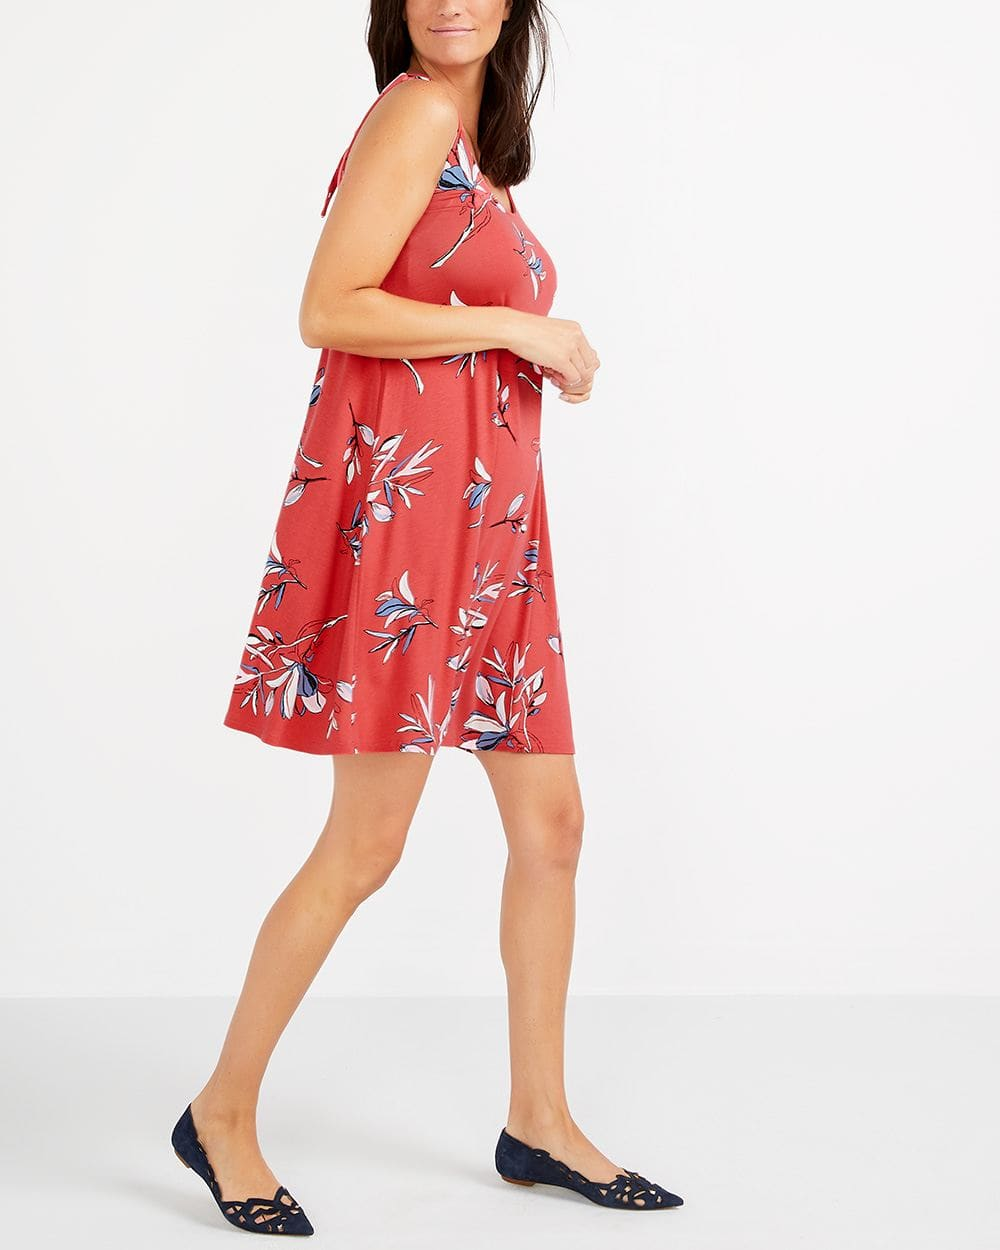 Sleeveless Back Knot Detail Dress